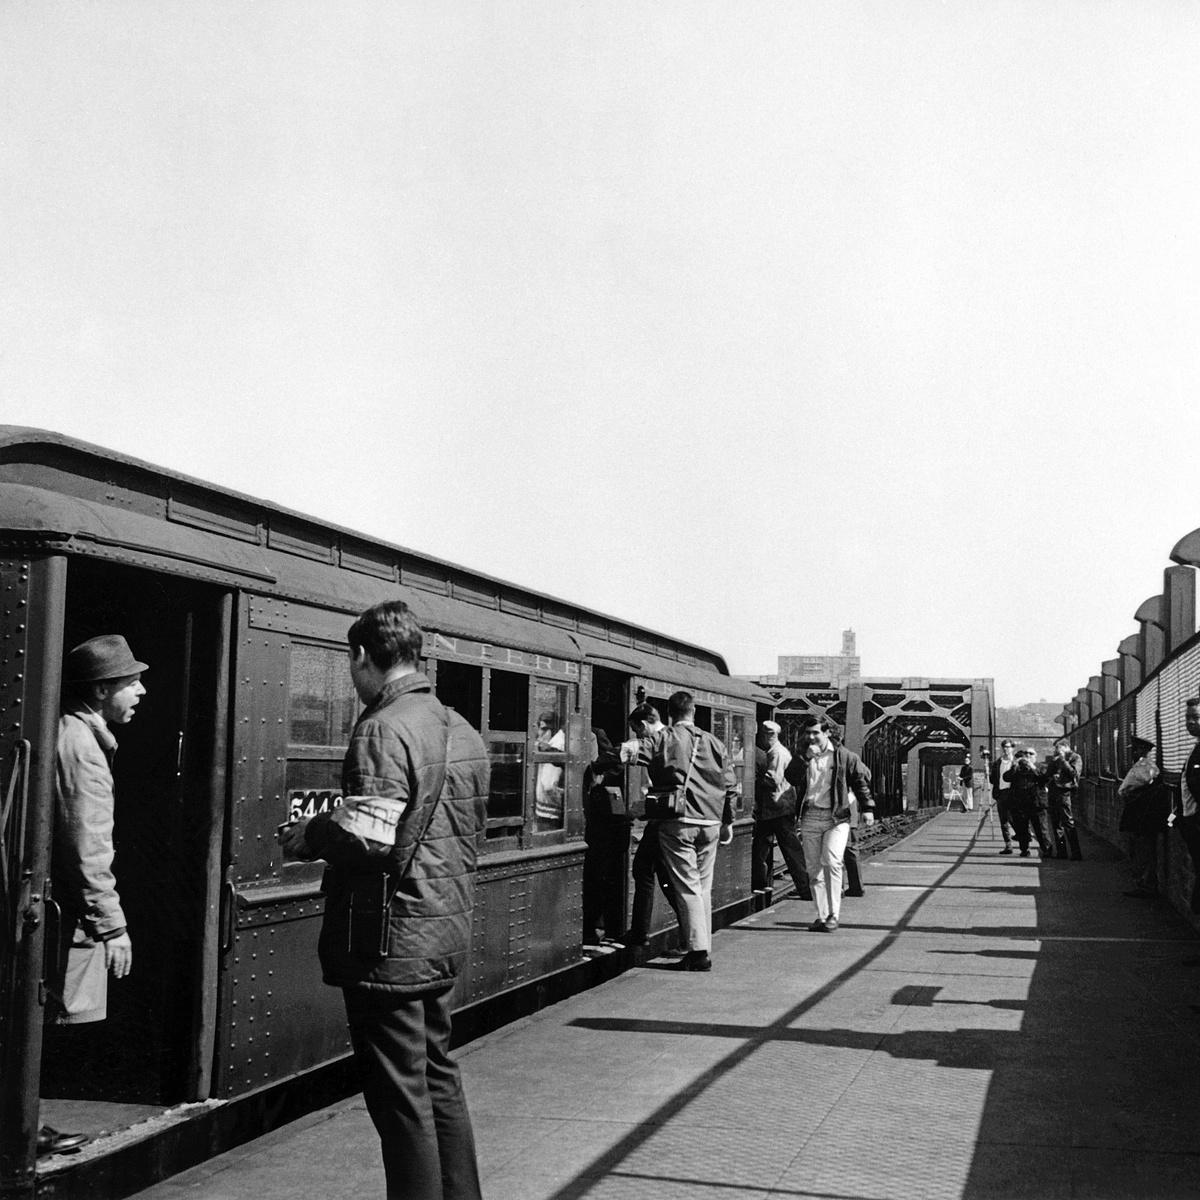 (476k, 1200x1200)<br><b>Country:</b> United States<br><b>City:</b> New York<br><b>System:</b> New York City Transit<br><b>Line:</b> IND Crosstown Line<br><b>Location:</b> Smith/9th Street<br><b>Route:</b> Fan Trip<br><b>Car:</b> Low-V (Museum Train) 5443 <br><b>Collection of:</b> David Pirmann<br><b>Date:</b> 4/6/1968<br><b>Viewed (this week/total):</b> 2 / 1227